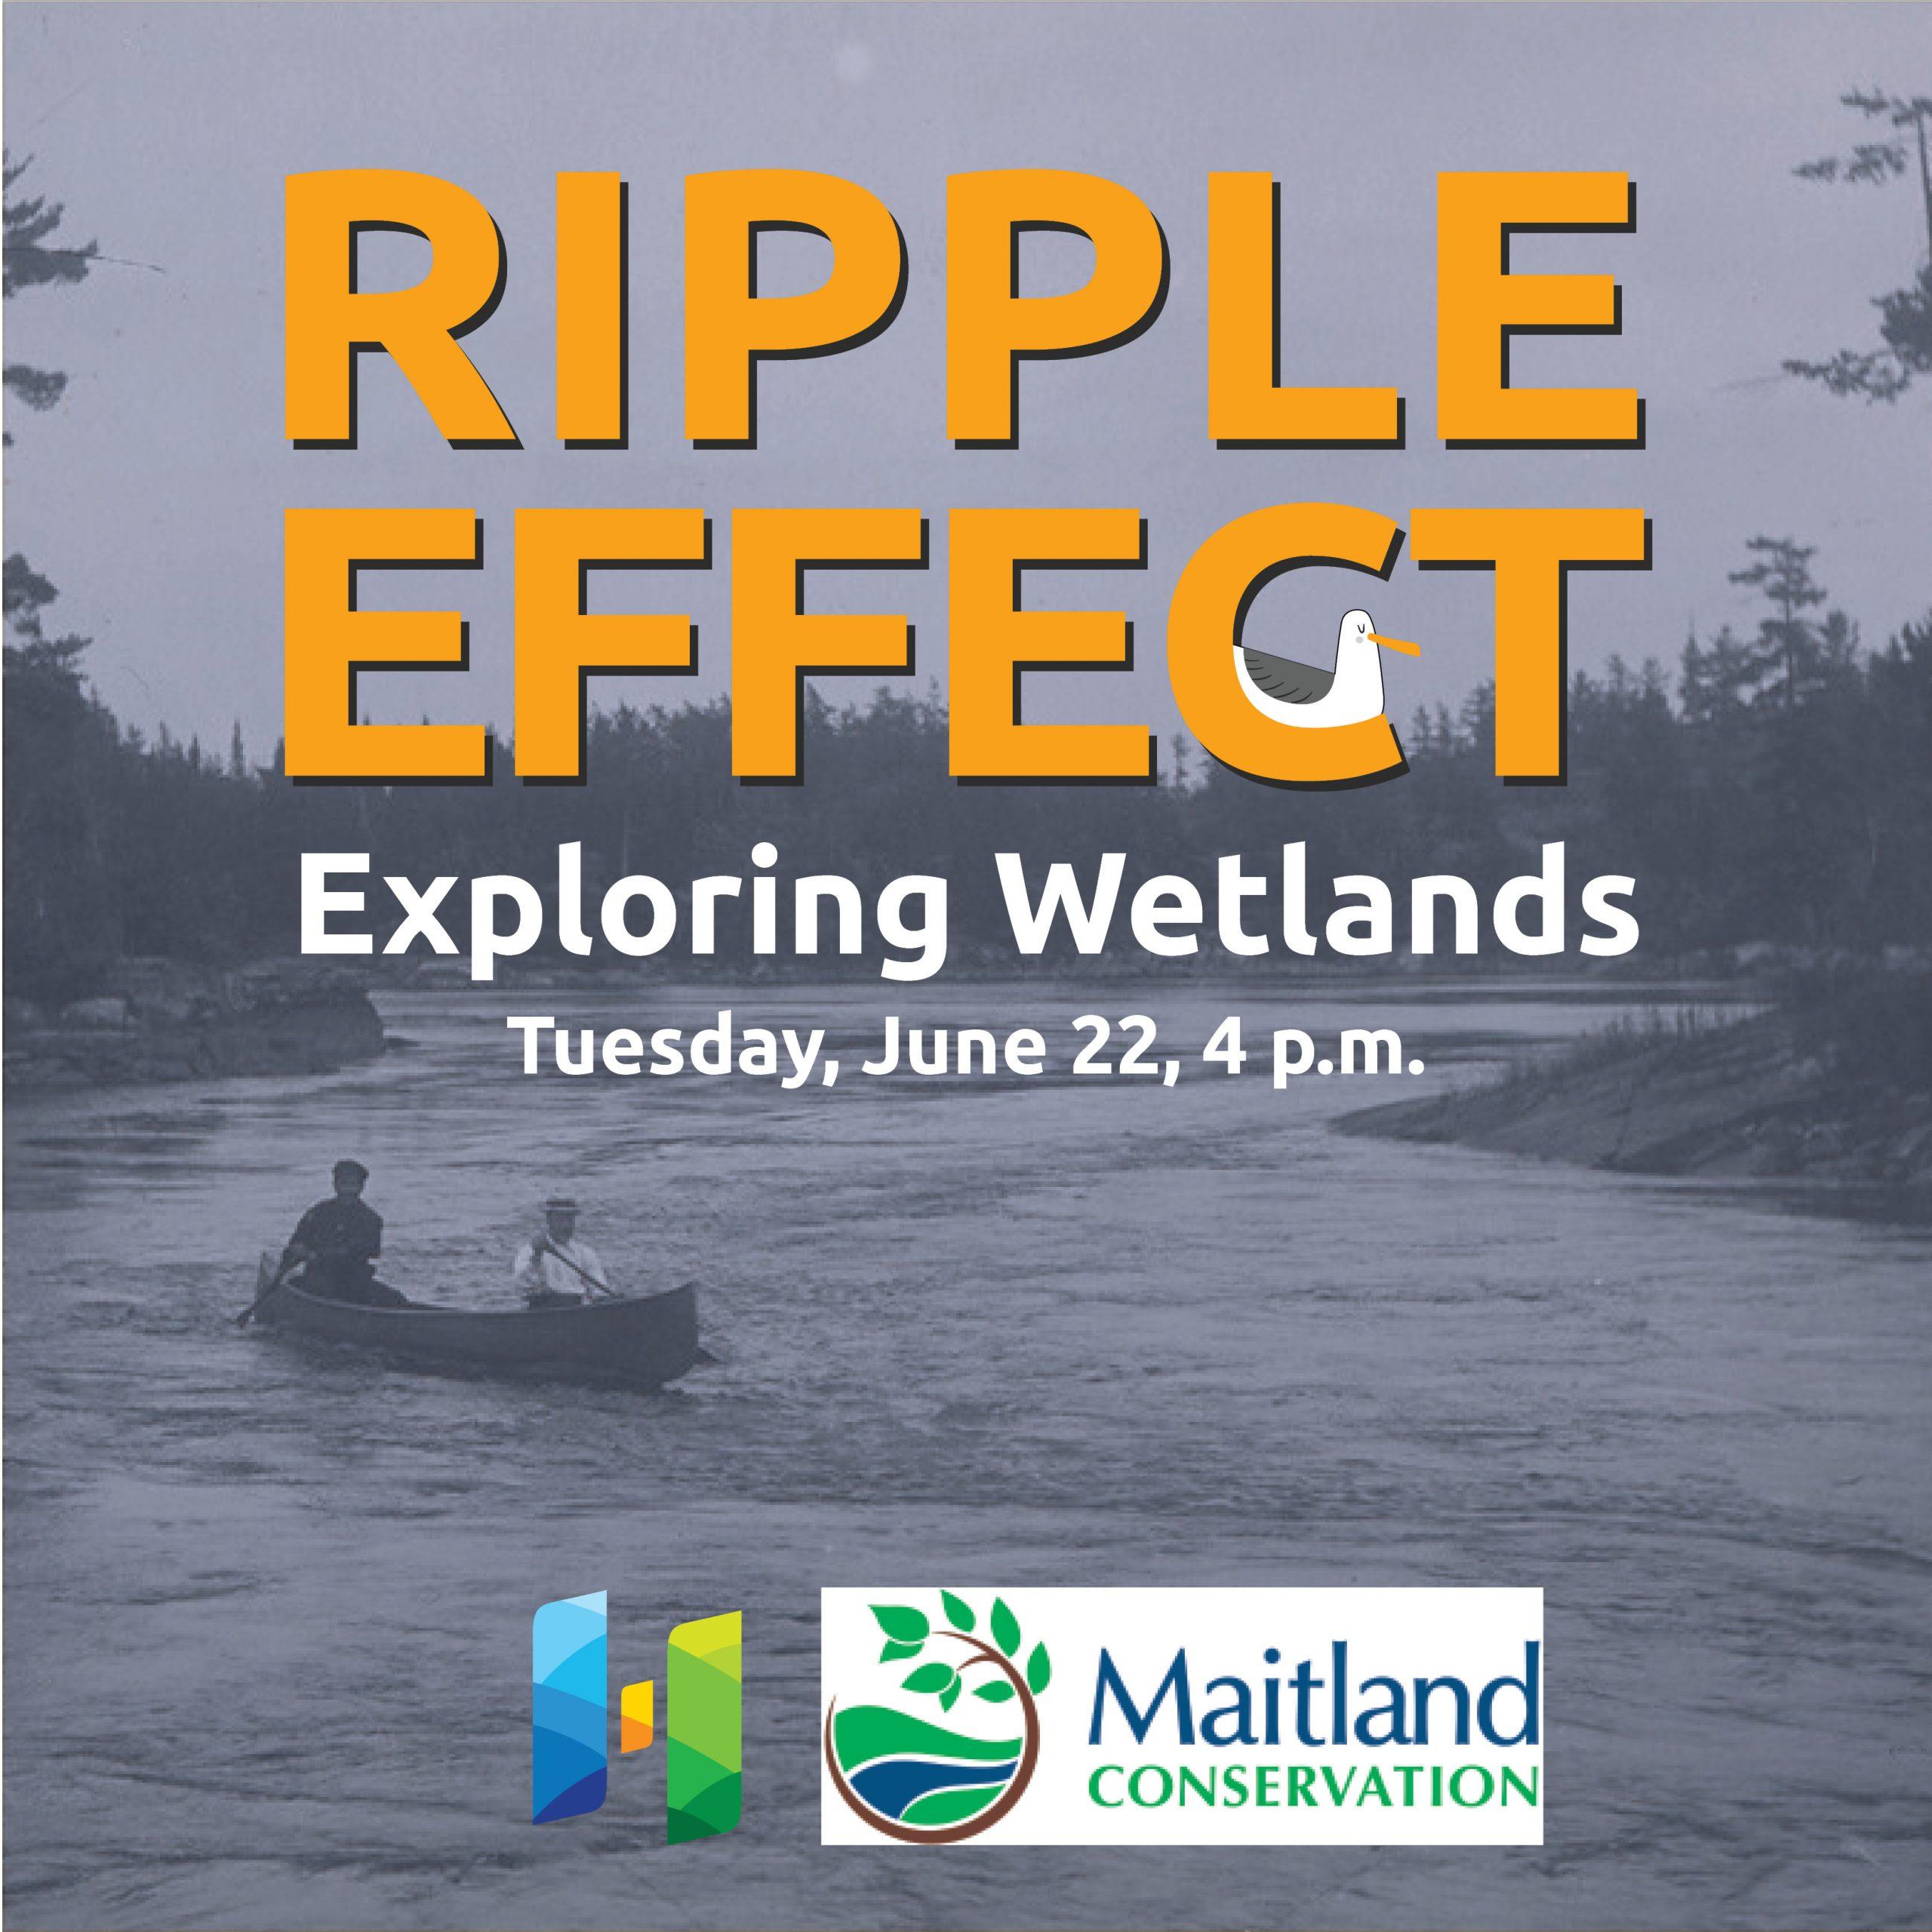 Ripple Effect: Exploring Wetlands June 22, 4 p.m.